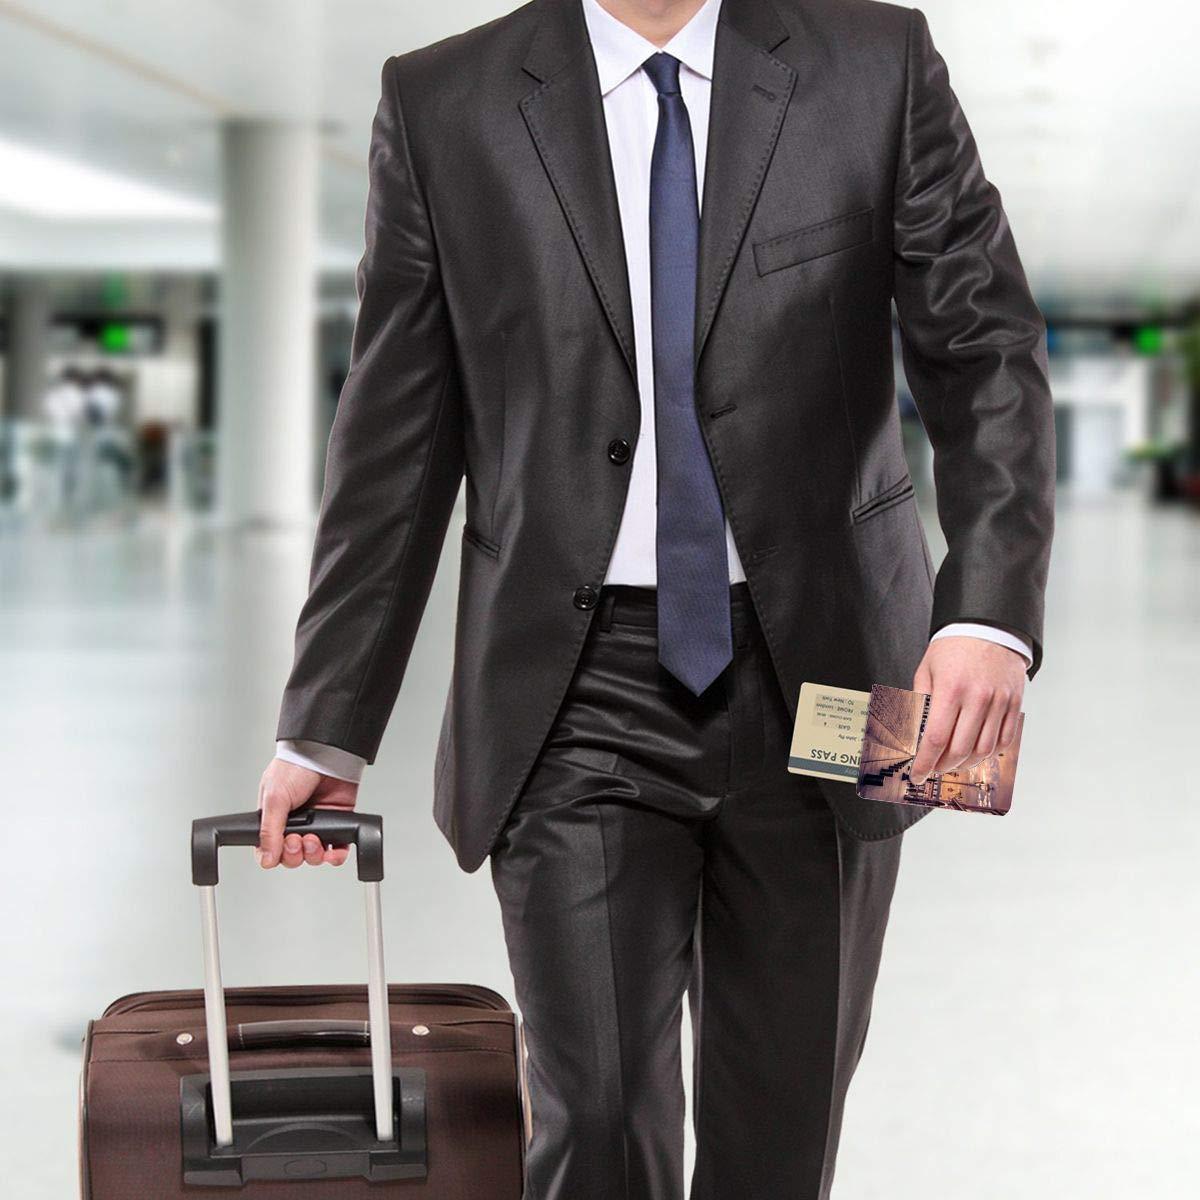 European Architectural Landscape Fashion Leather Passport Holder Cover Case Travel Wallet 6.5 In